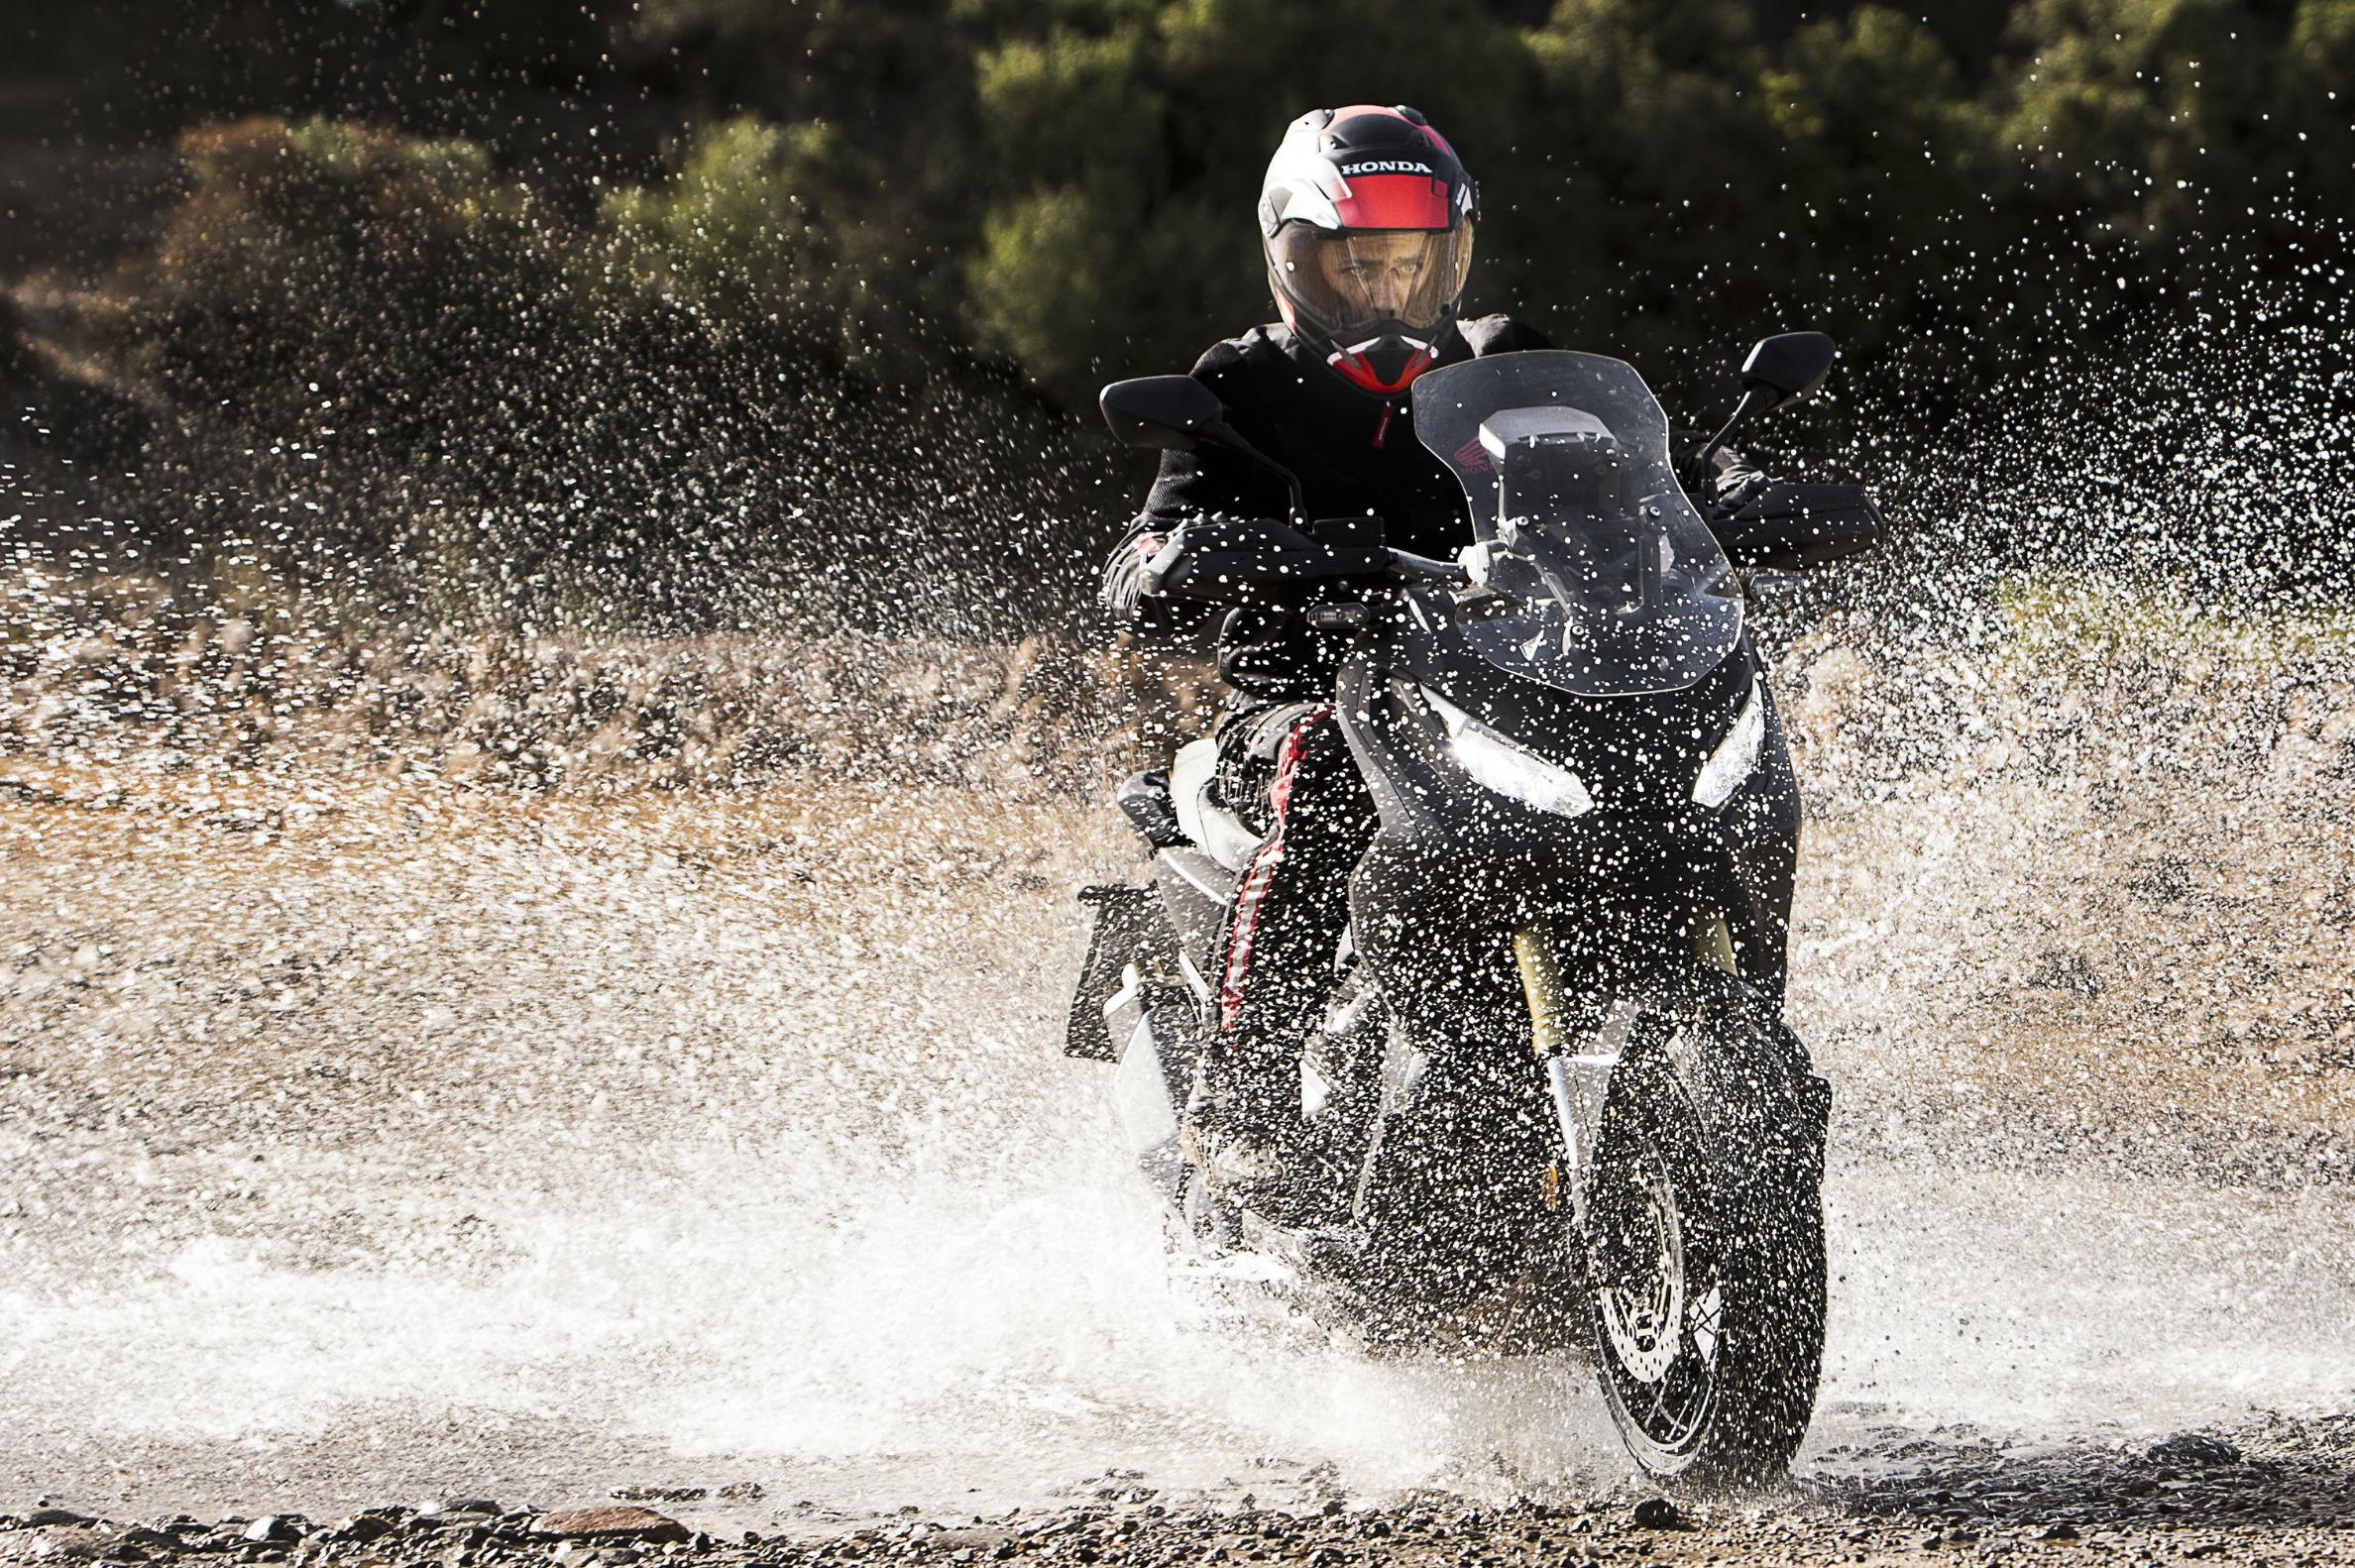 First look: 2017 Honda X-ADV adventure scooter - BikesRepublic